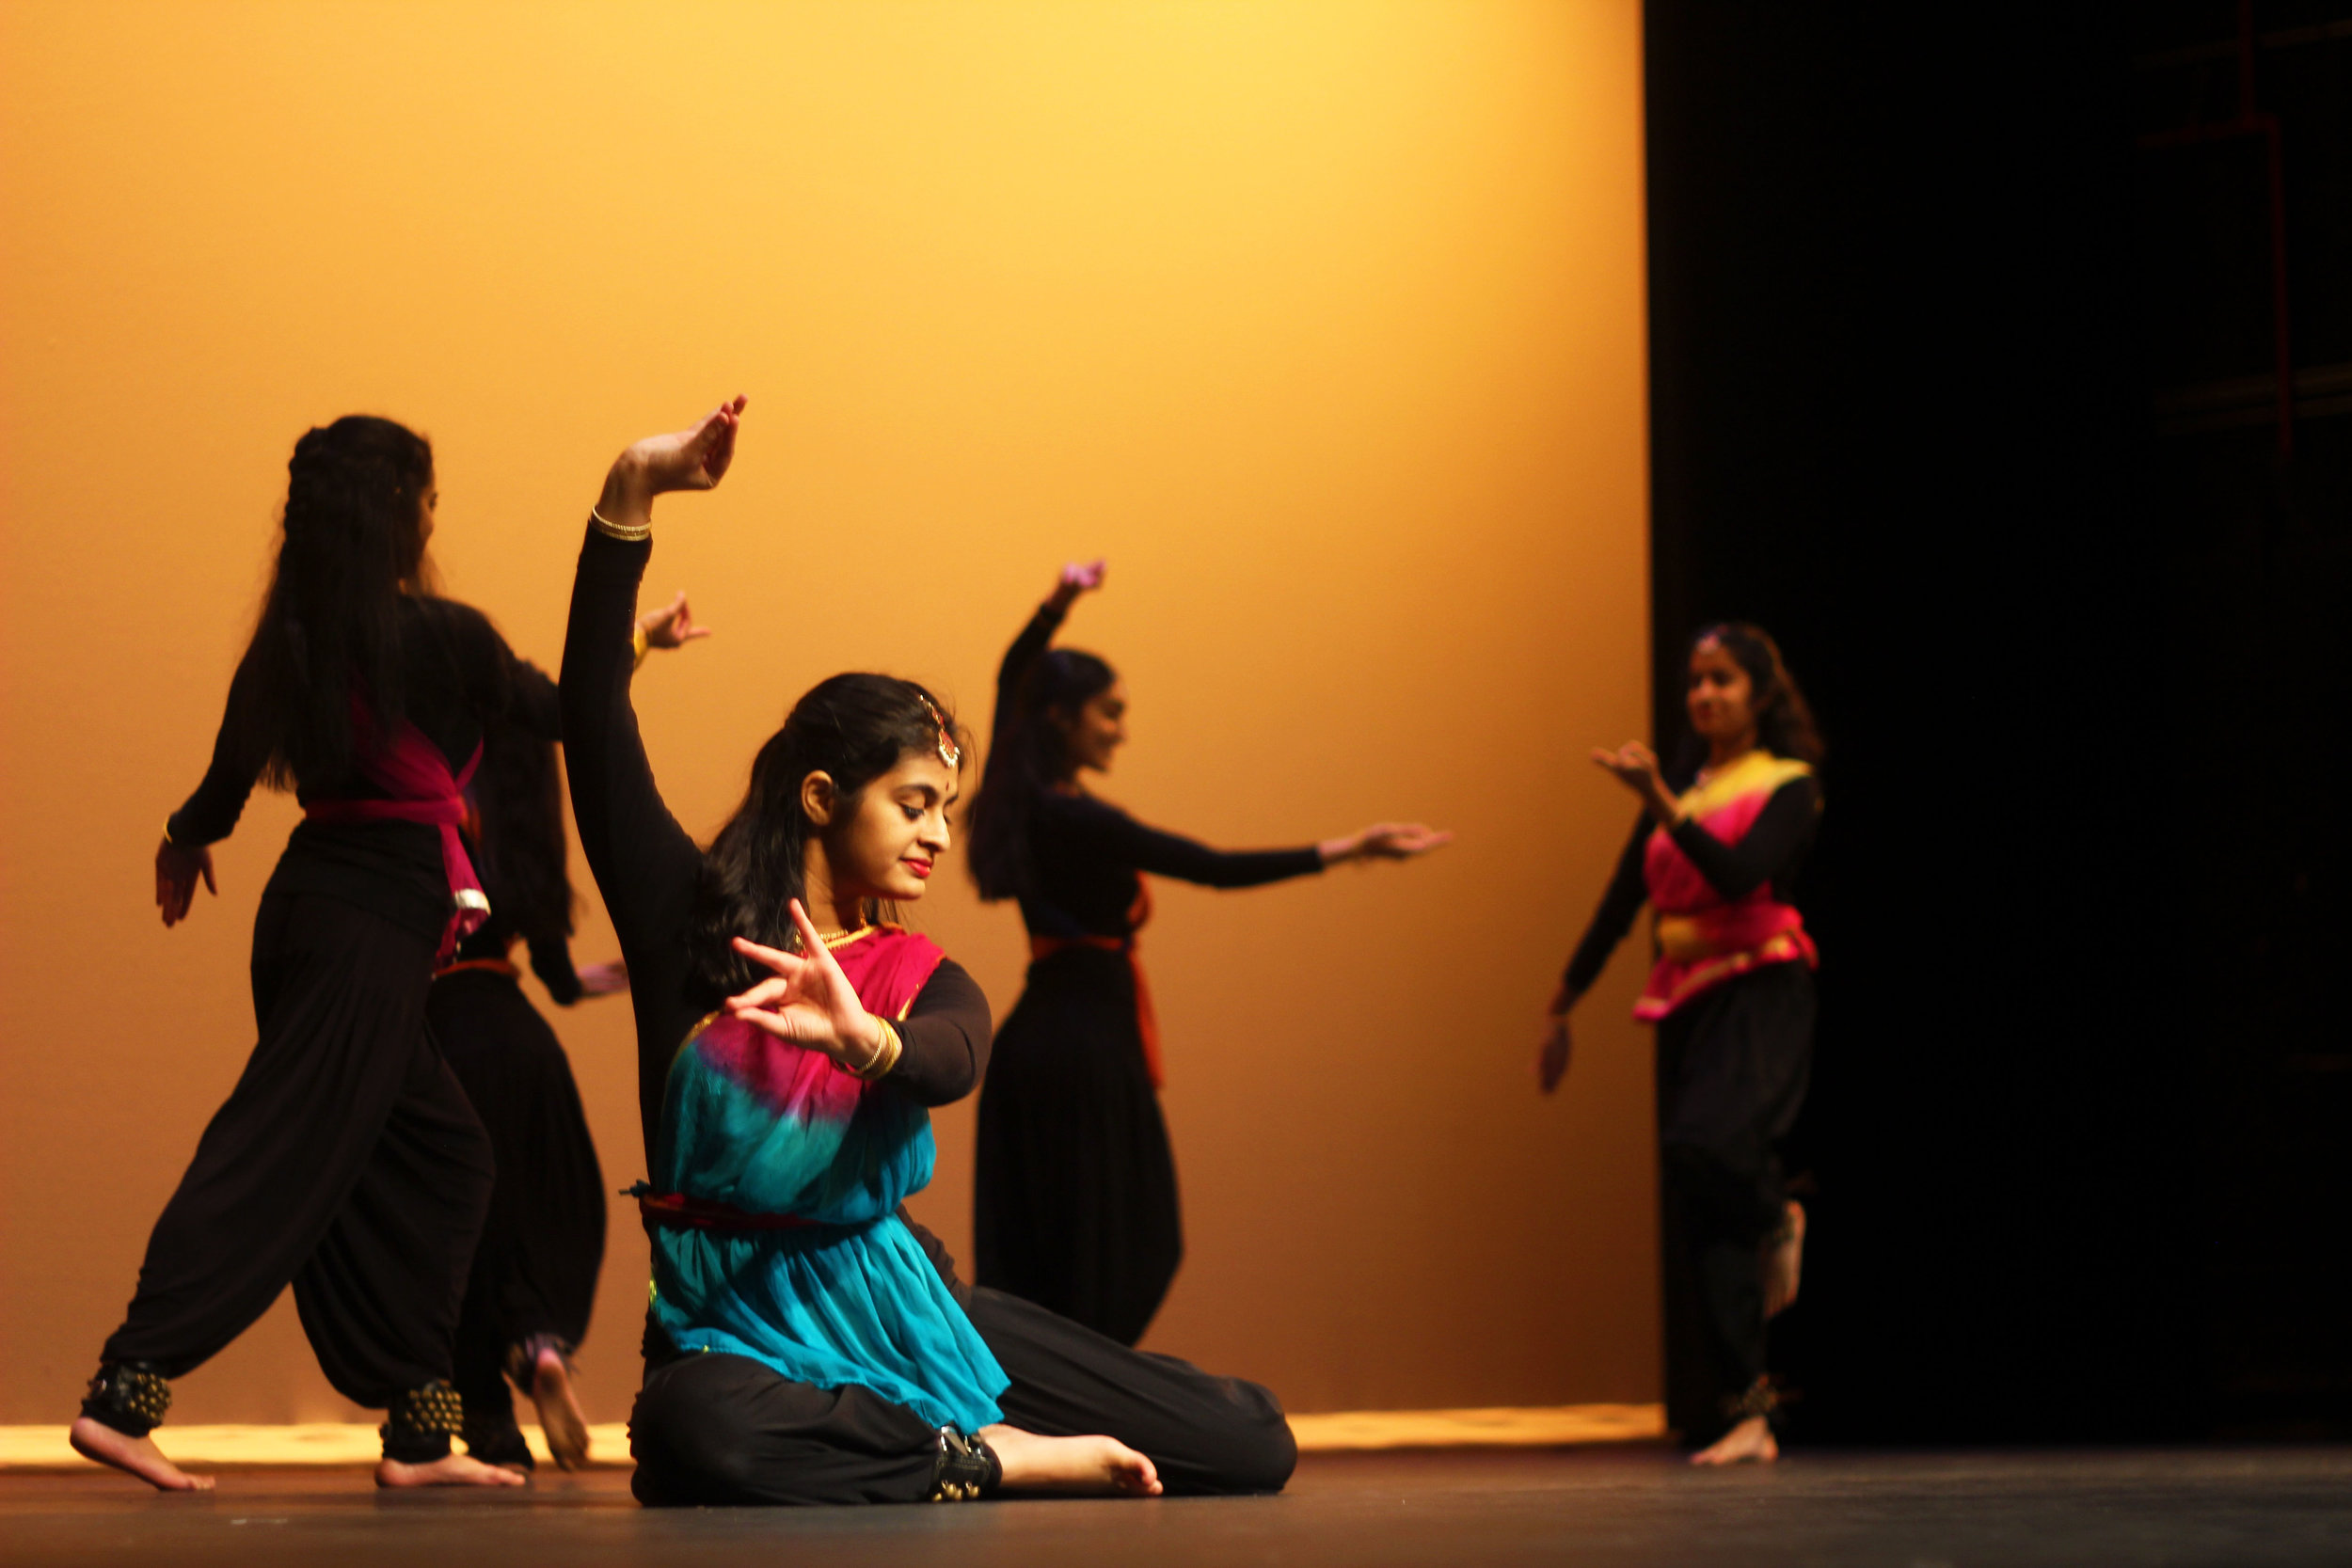 All-girl dance group, Zohba, performs to Pakistani instrumental music